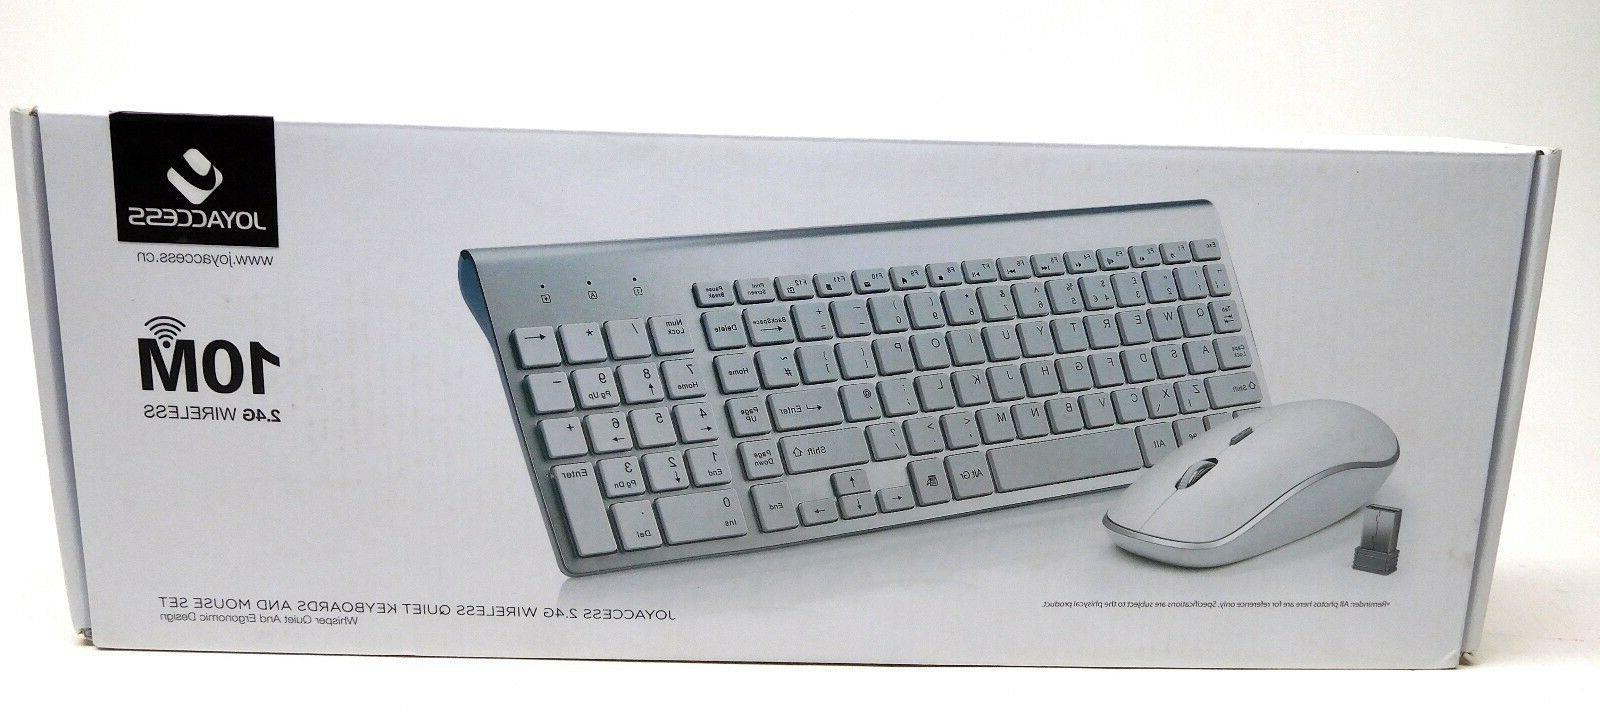 JOYACCESS Wireless and Silent Mouse JA CB2 #4797